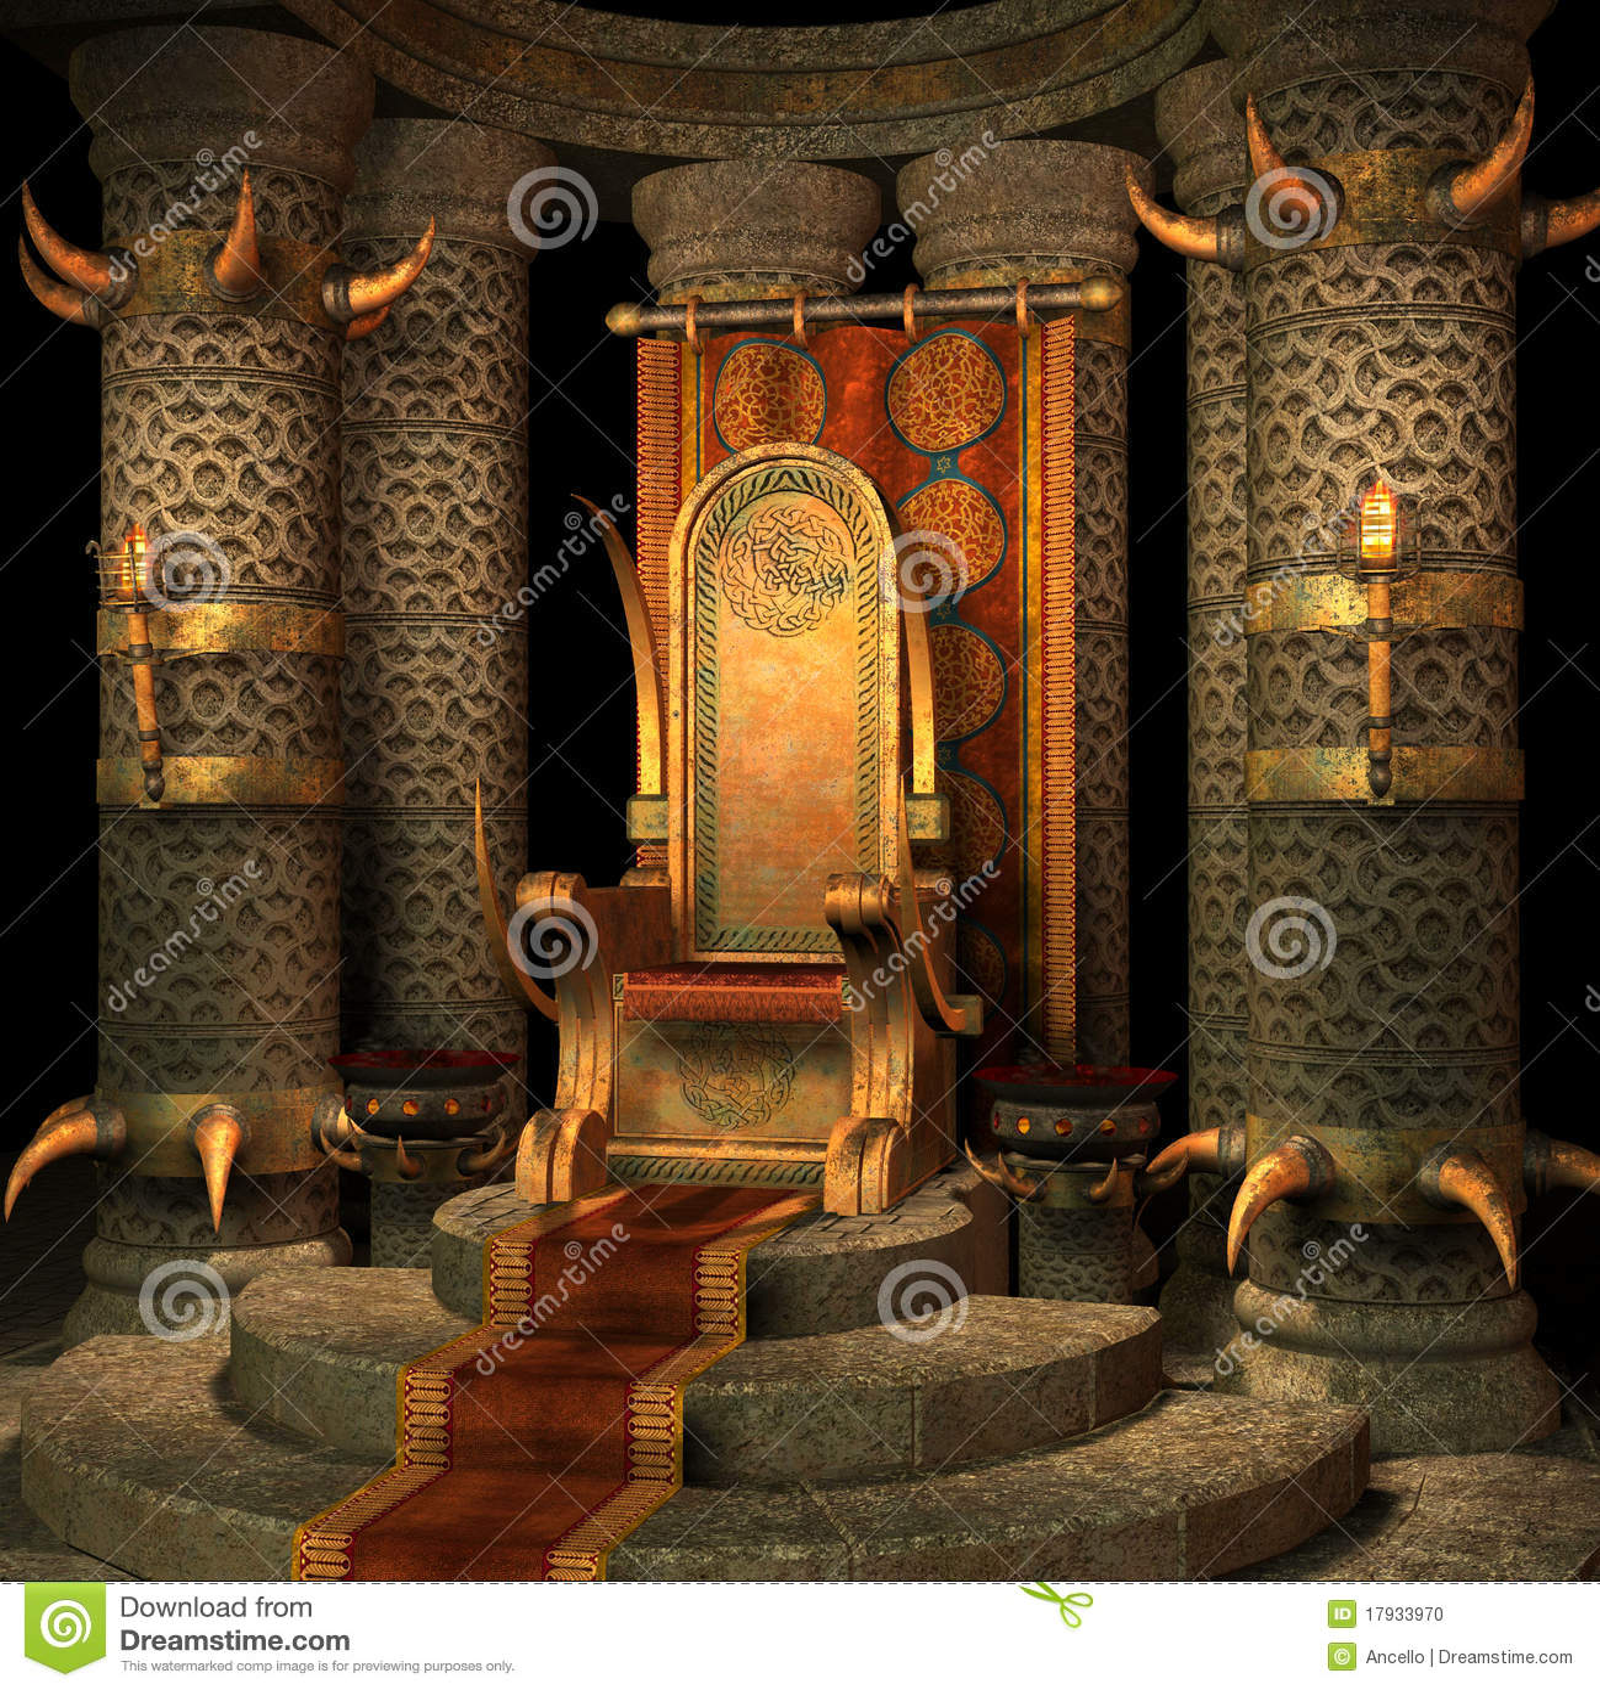 God Animation Wallpaper Fantasy Throne Room Stock Illustration Image Of Wall